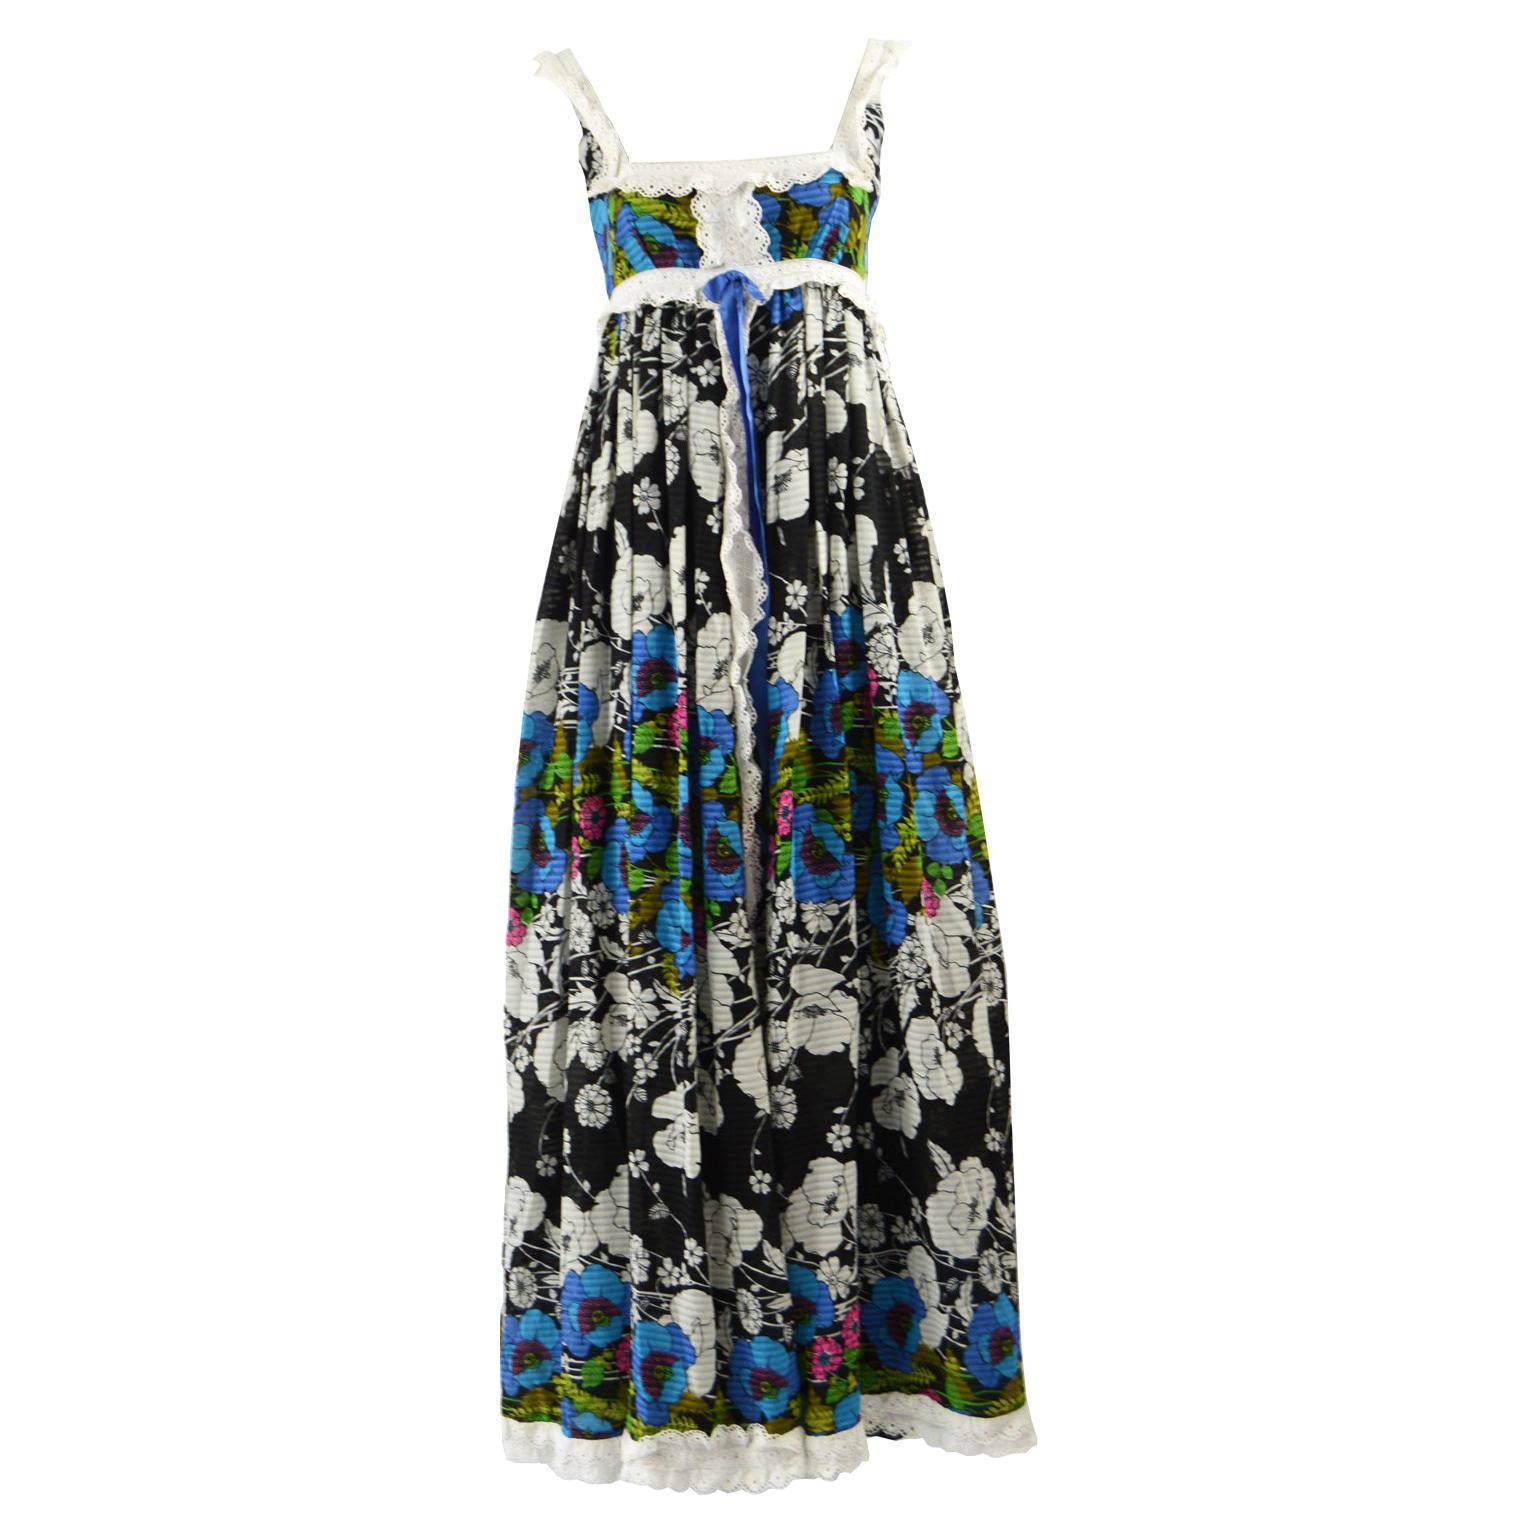 Jean Varon Vintage Sleeveless Boho Maxi Dress, 1970s